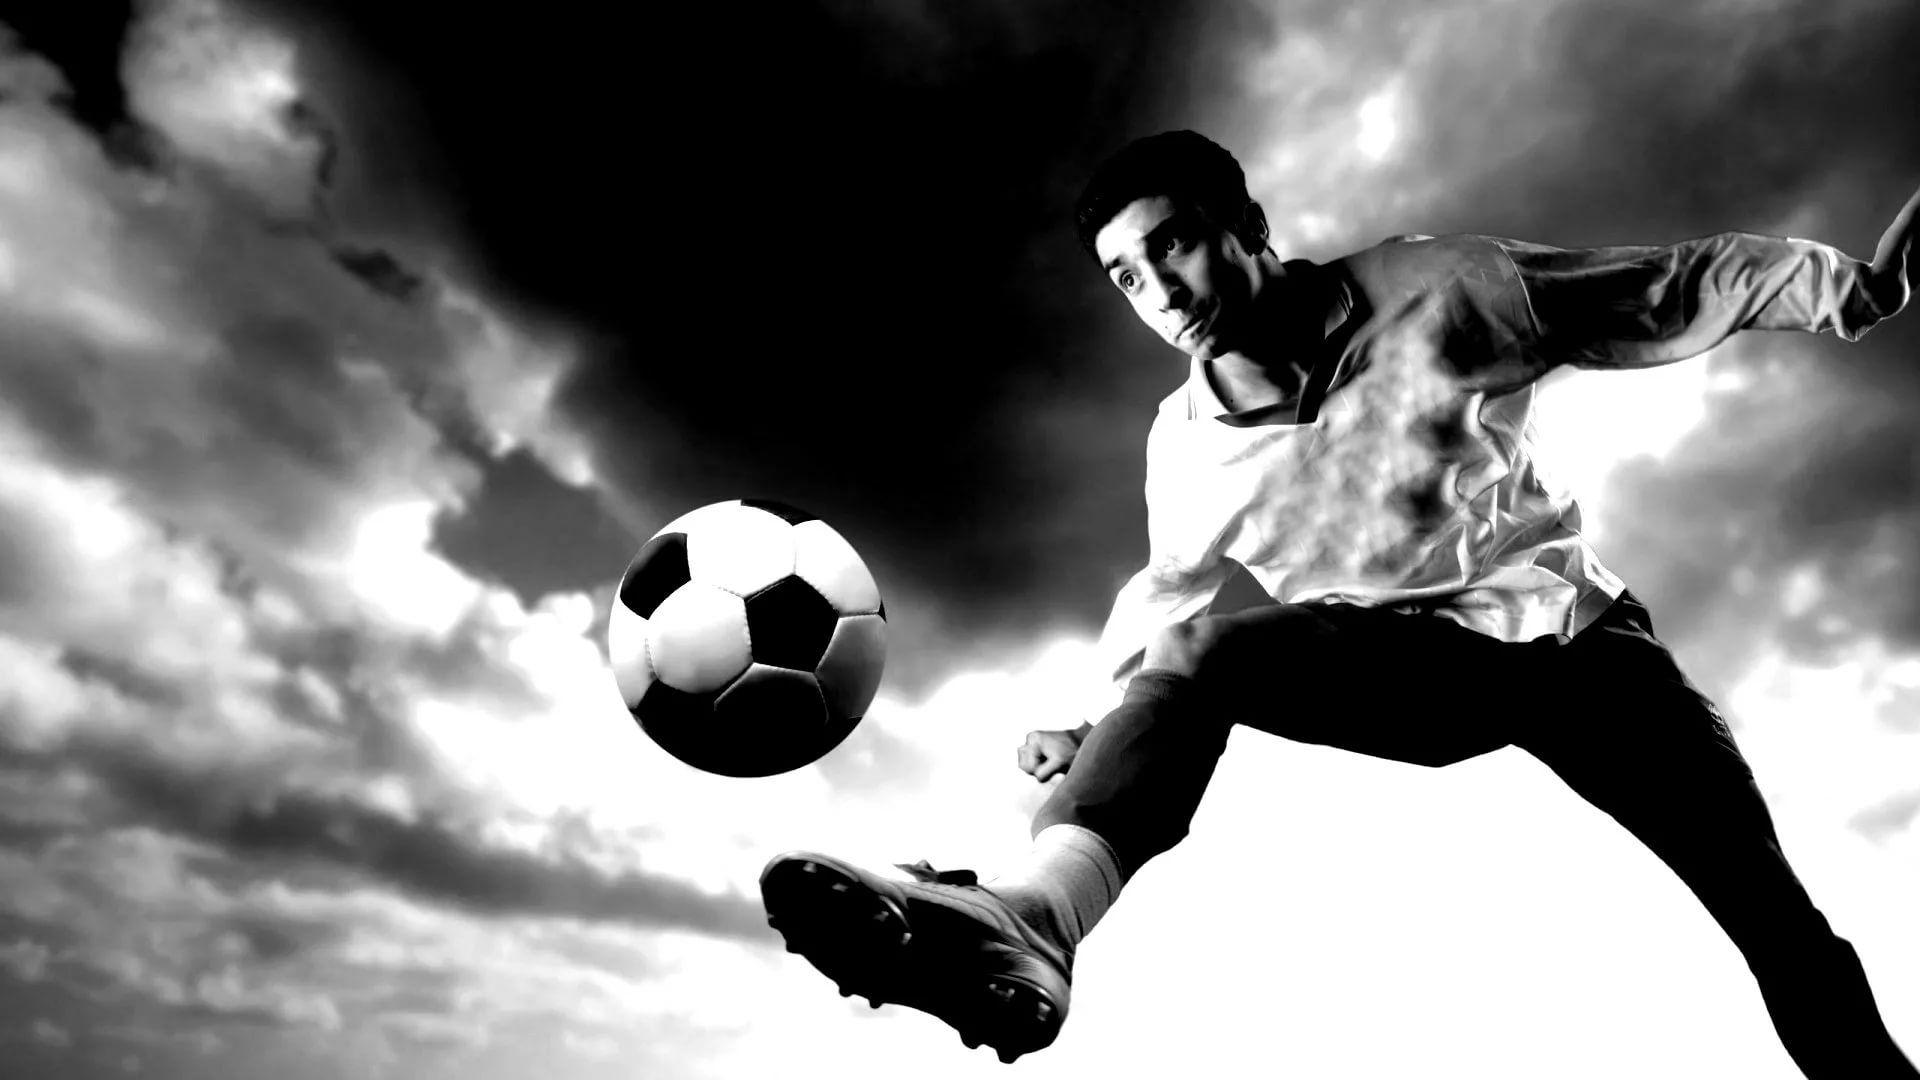 Soccer Player wallpaper hd